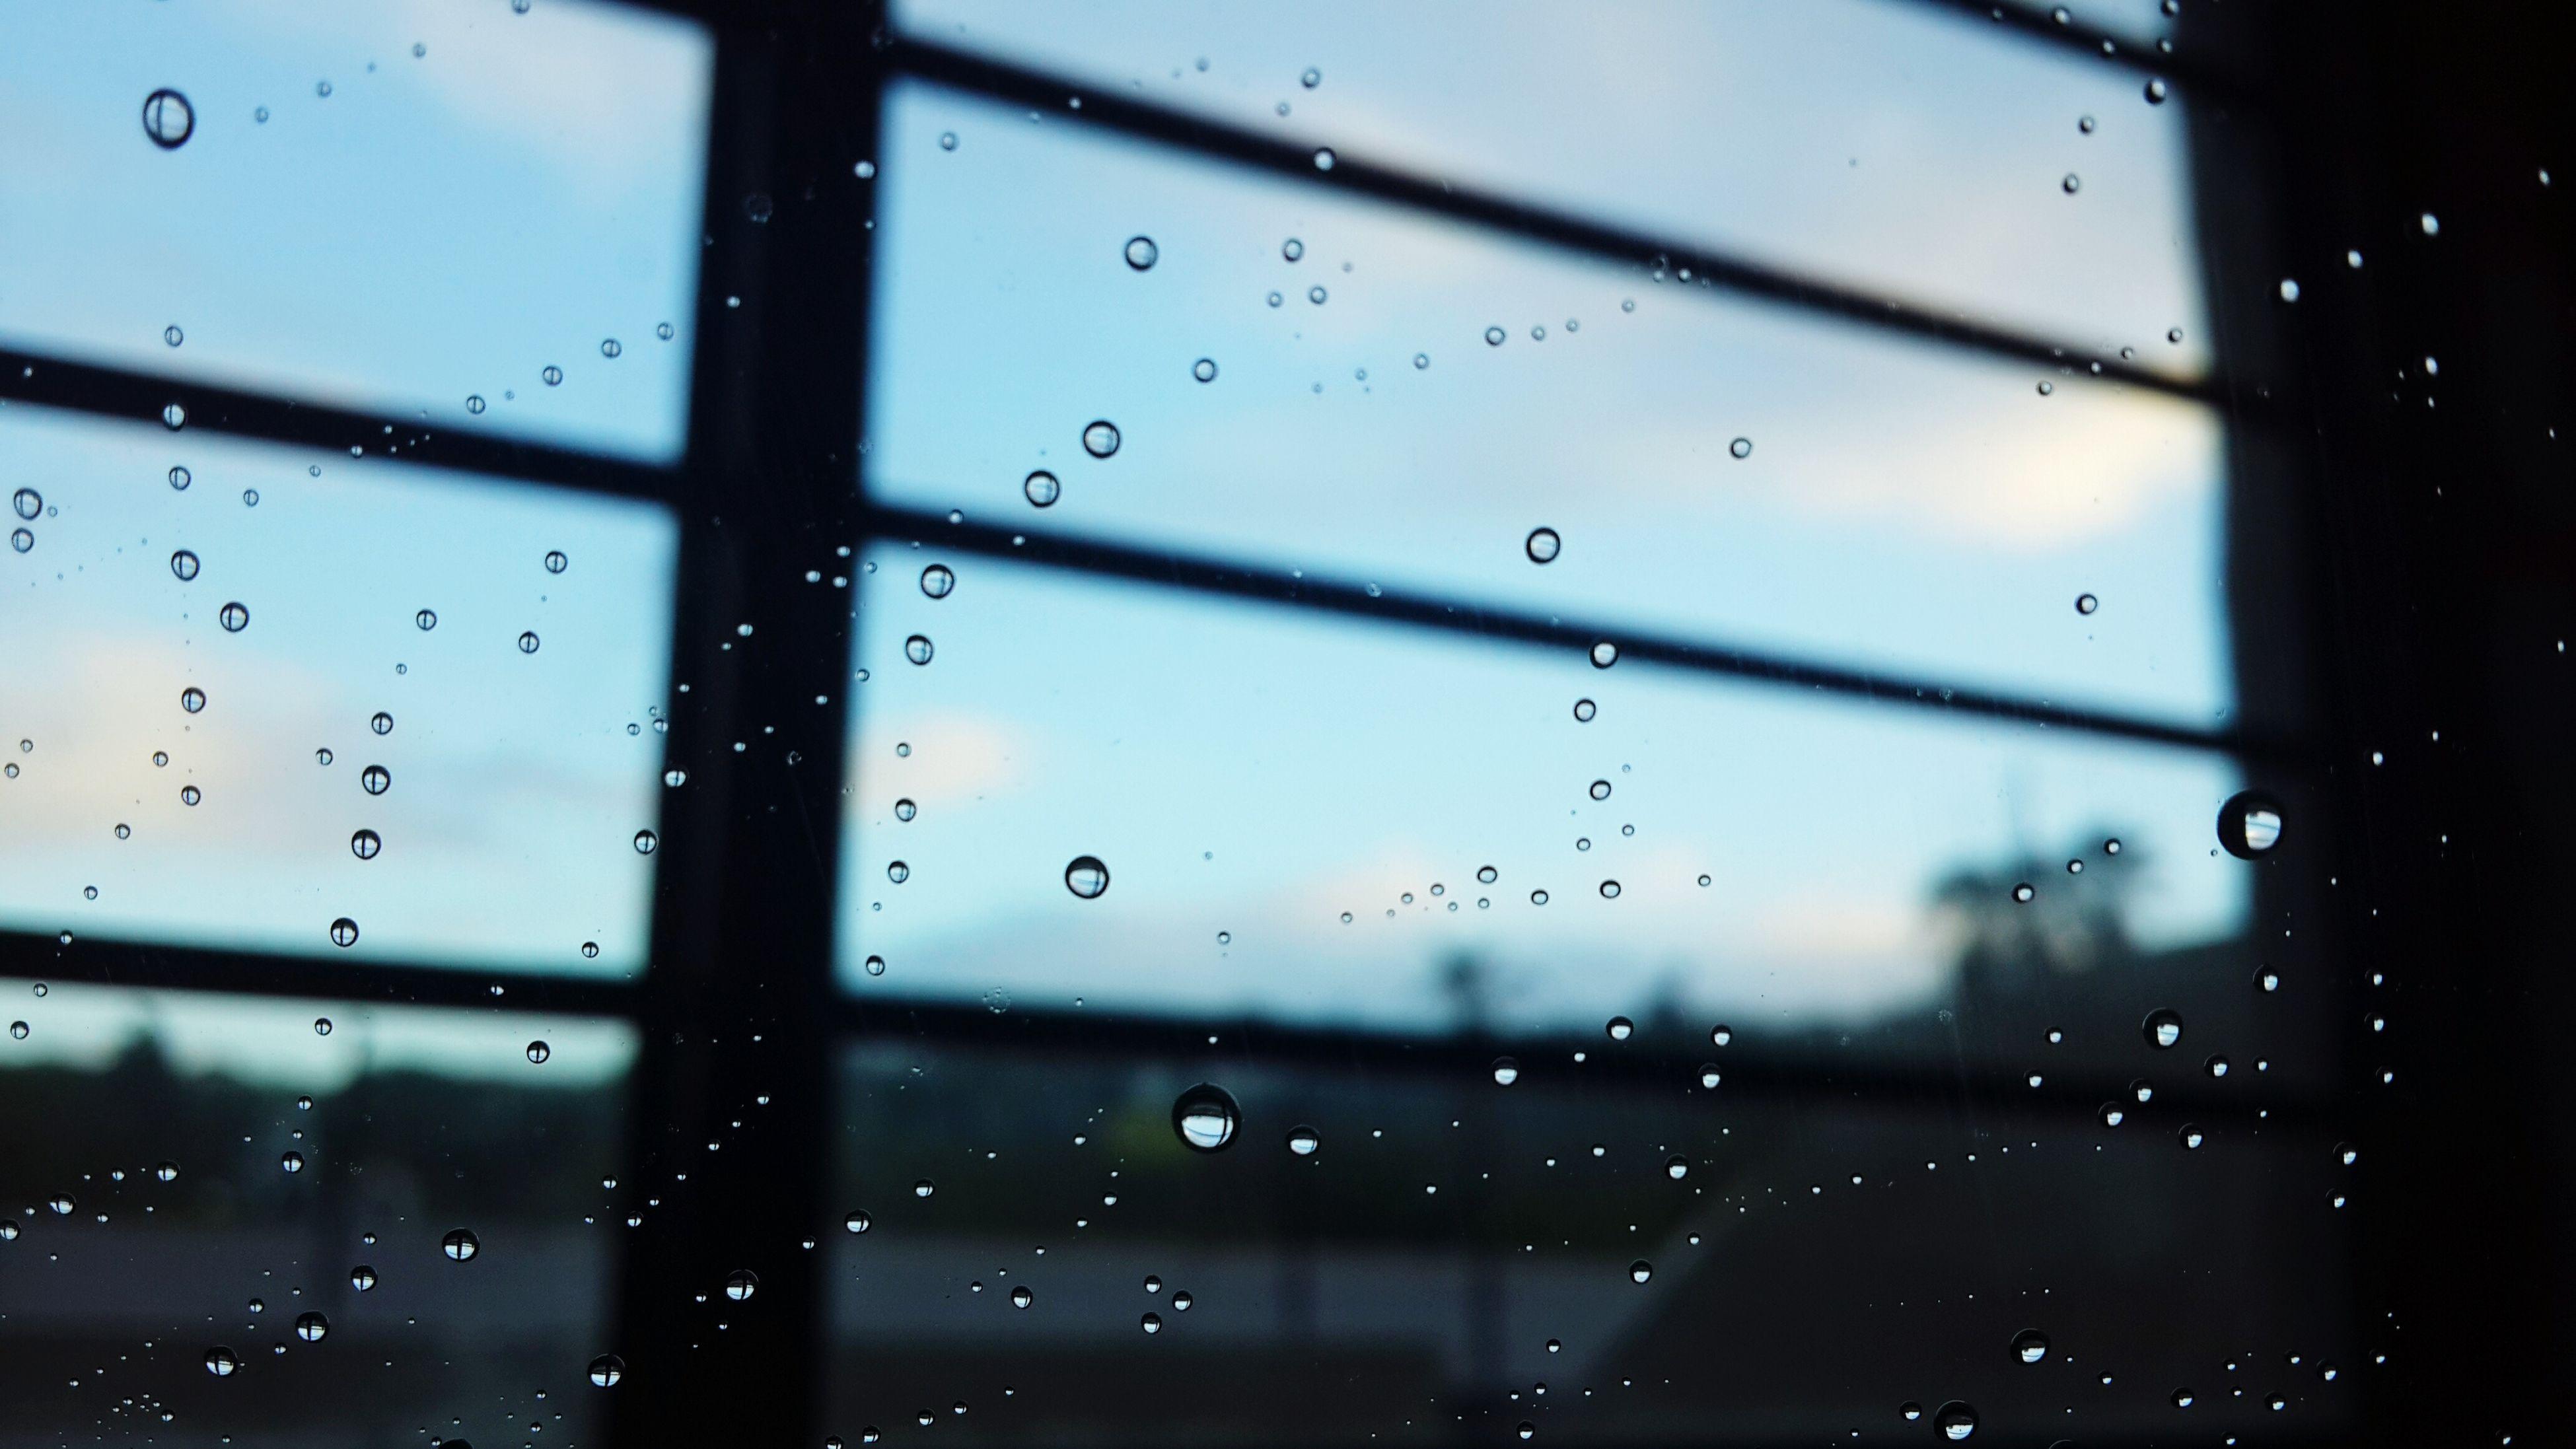 window, drop, full frame, transparent, water, rain, backgrounds, no people, rainy season, wet, close-up, indoors, raindrop, nature, day, sky